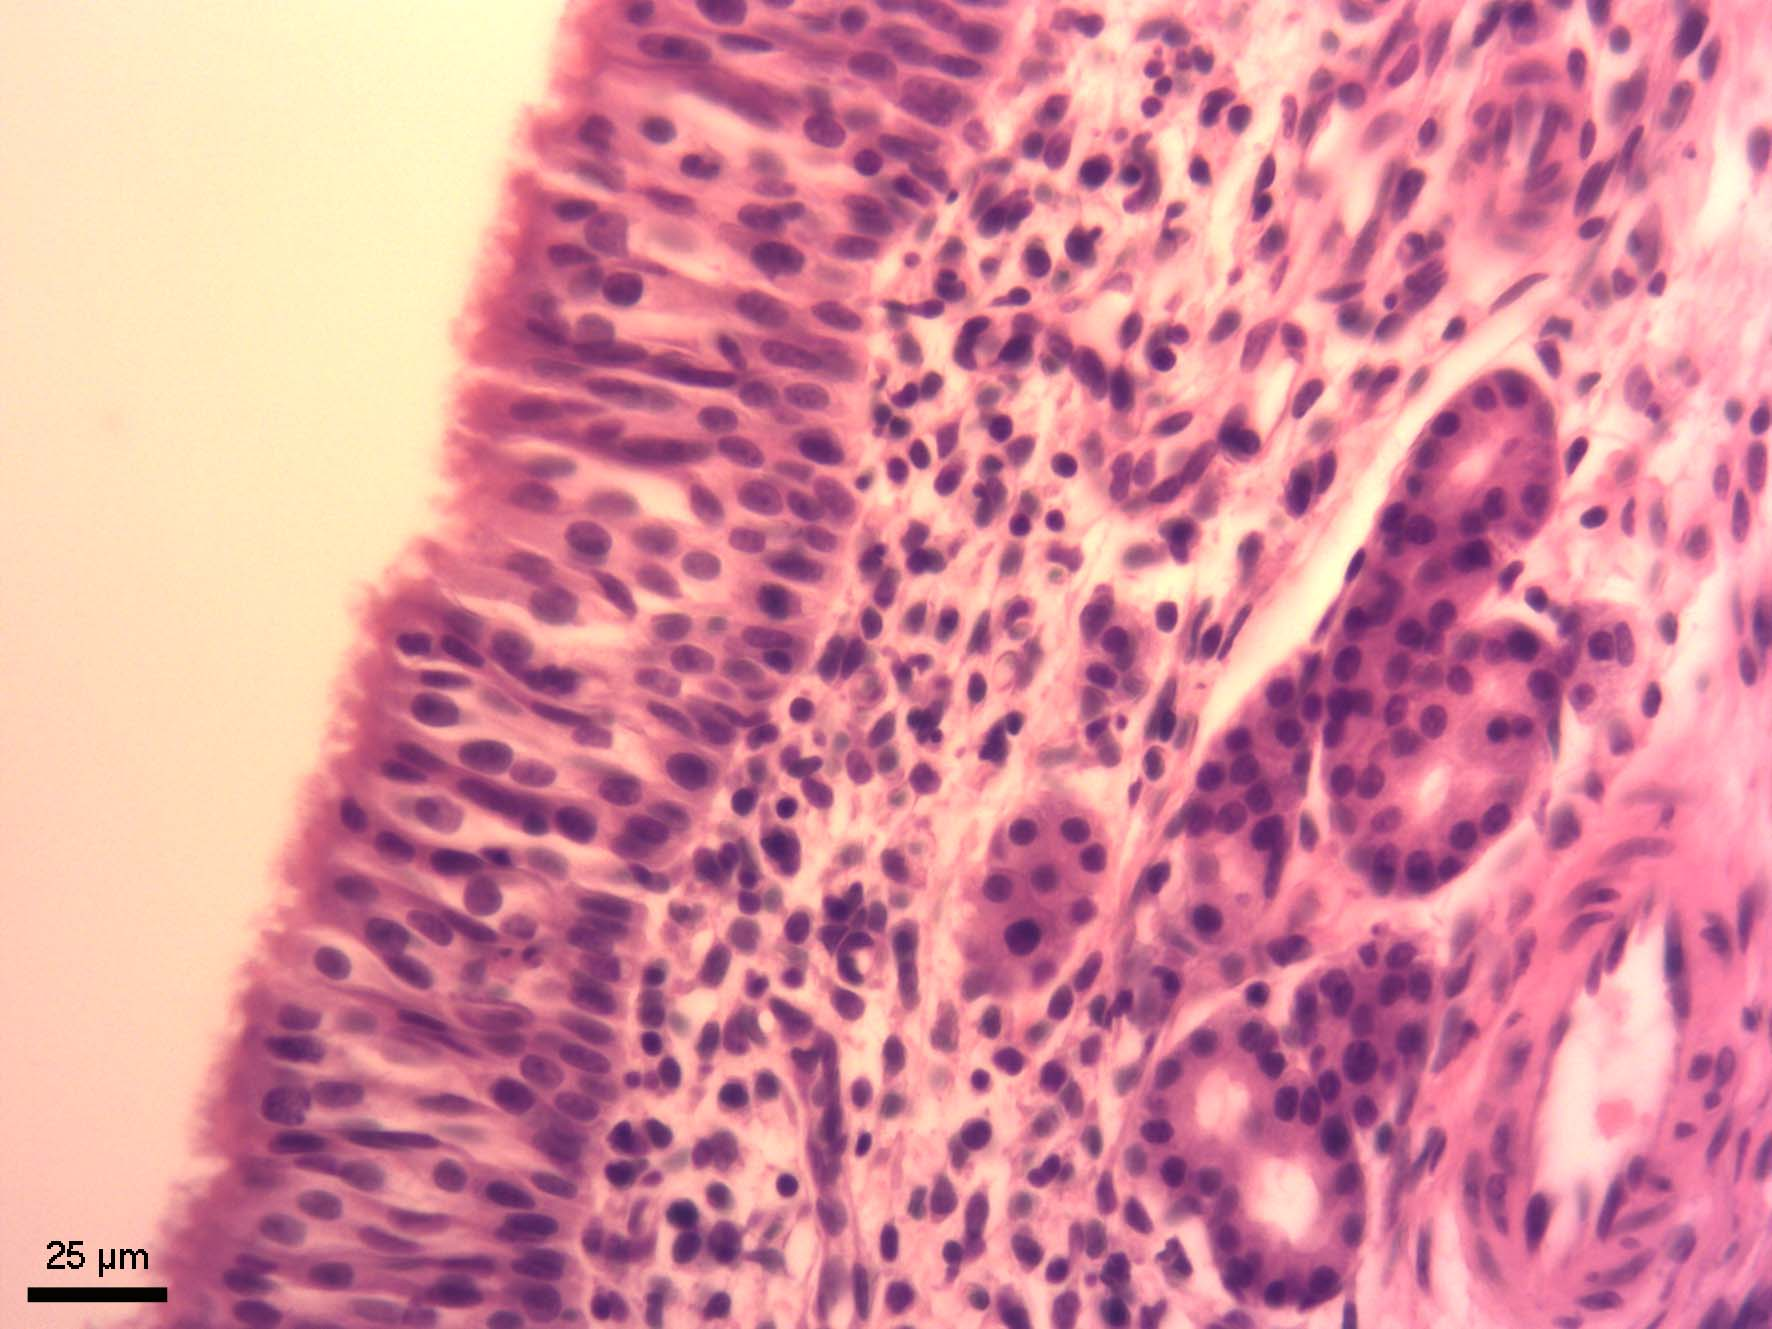 Čichový okrsek nosní sliznice (regio olfactoria tunicae mucosae nasi)